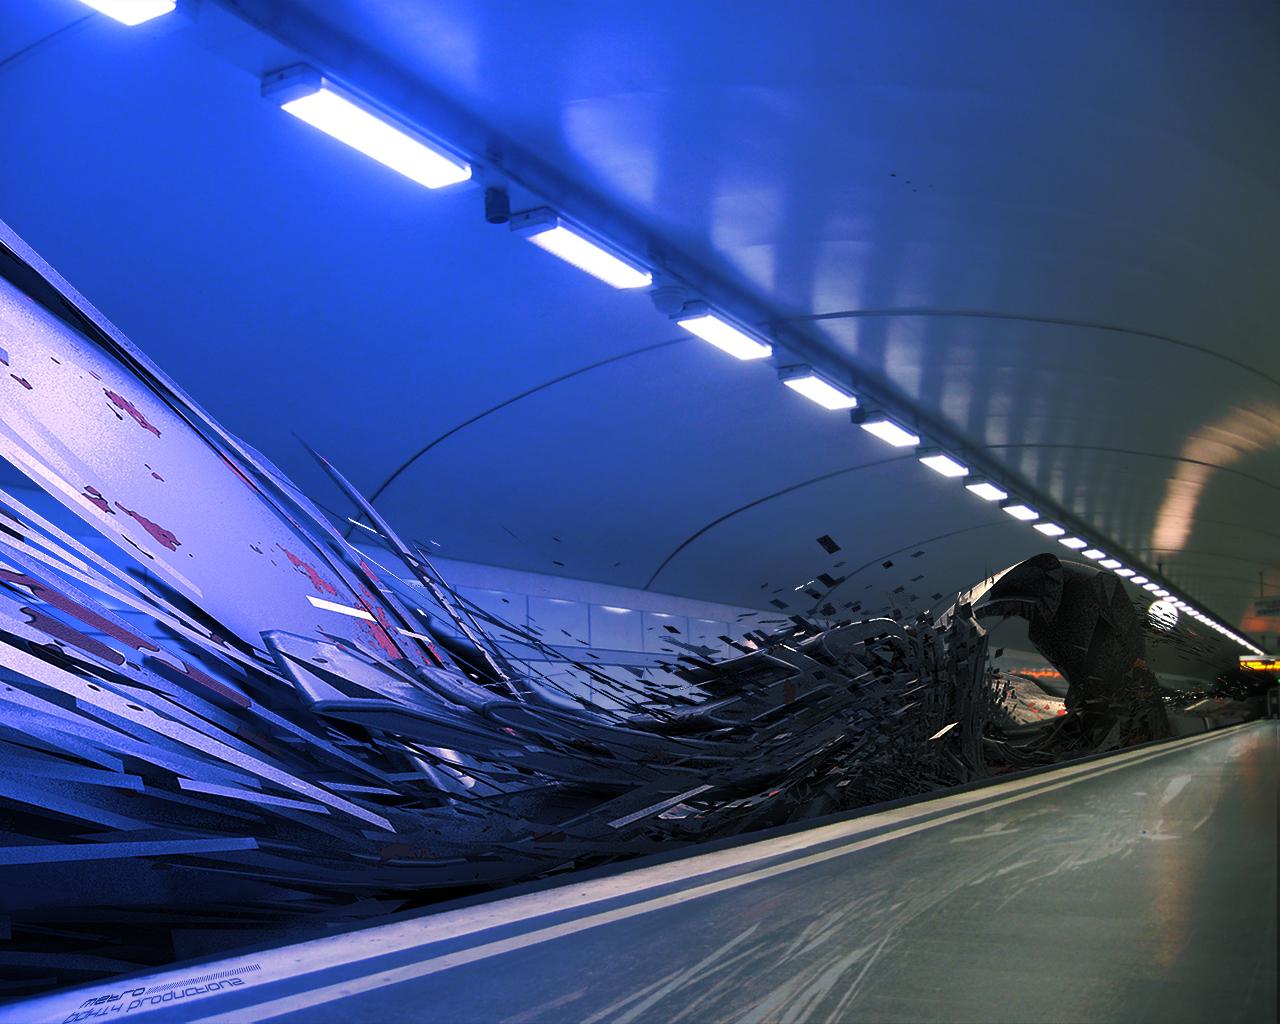 Metro by bdk14